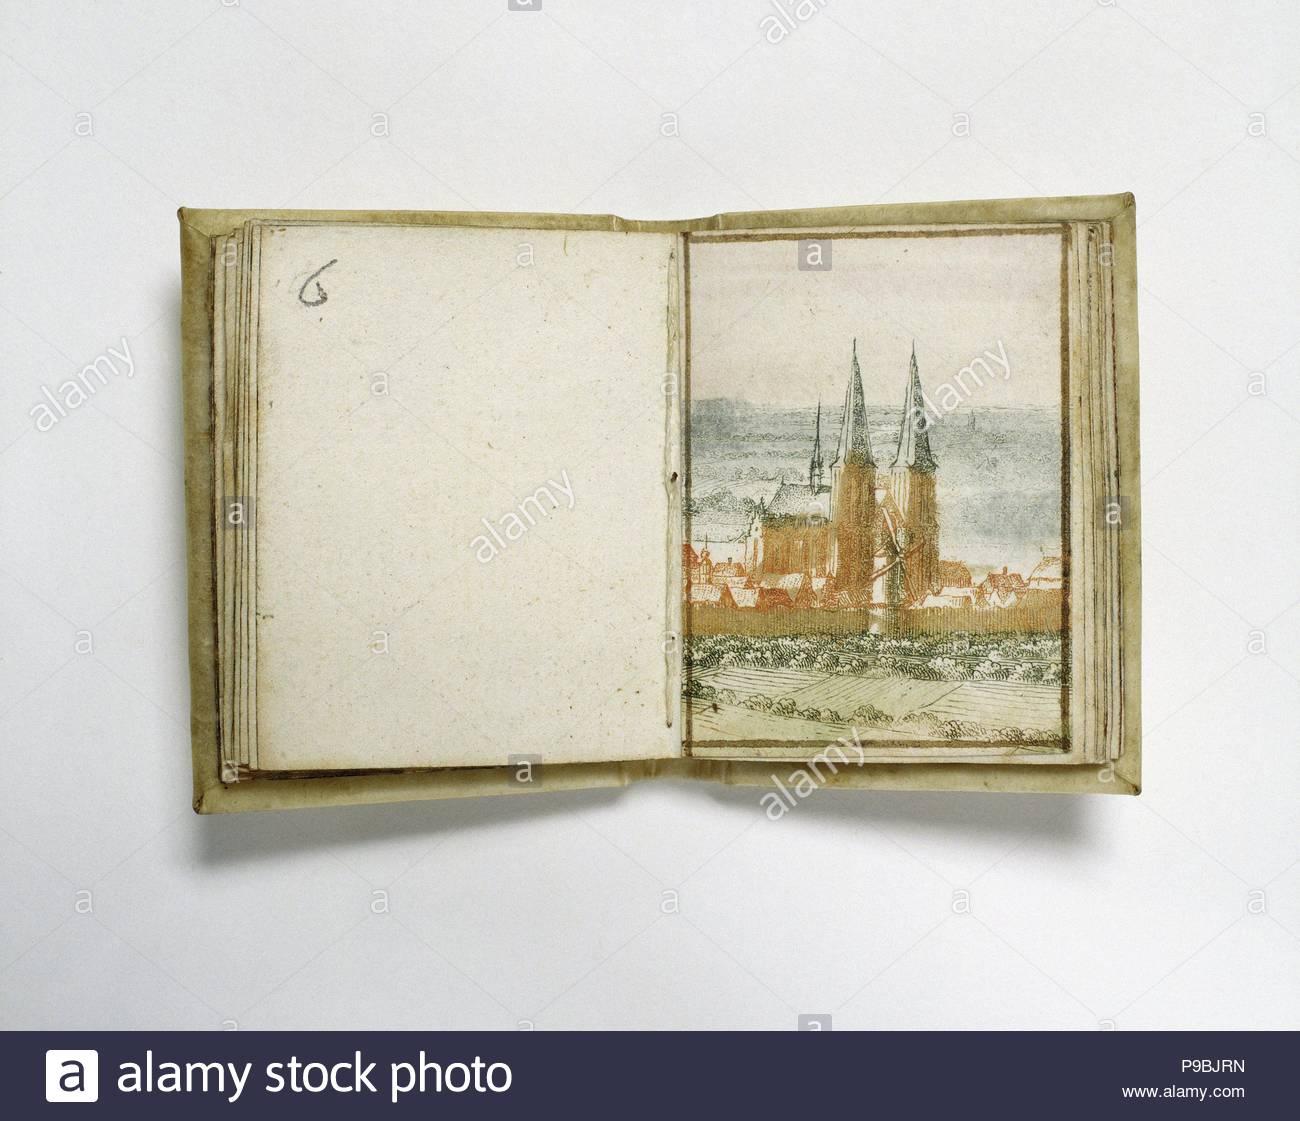 Großartig Jagd Gerahmte Bilder Bilder - Familienfoto Kunst Ideen ...